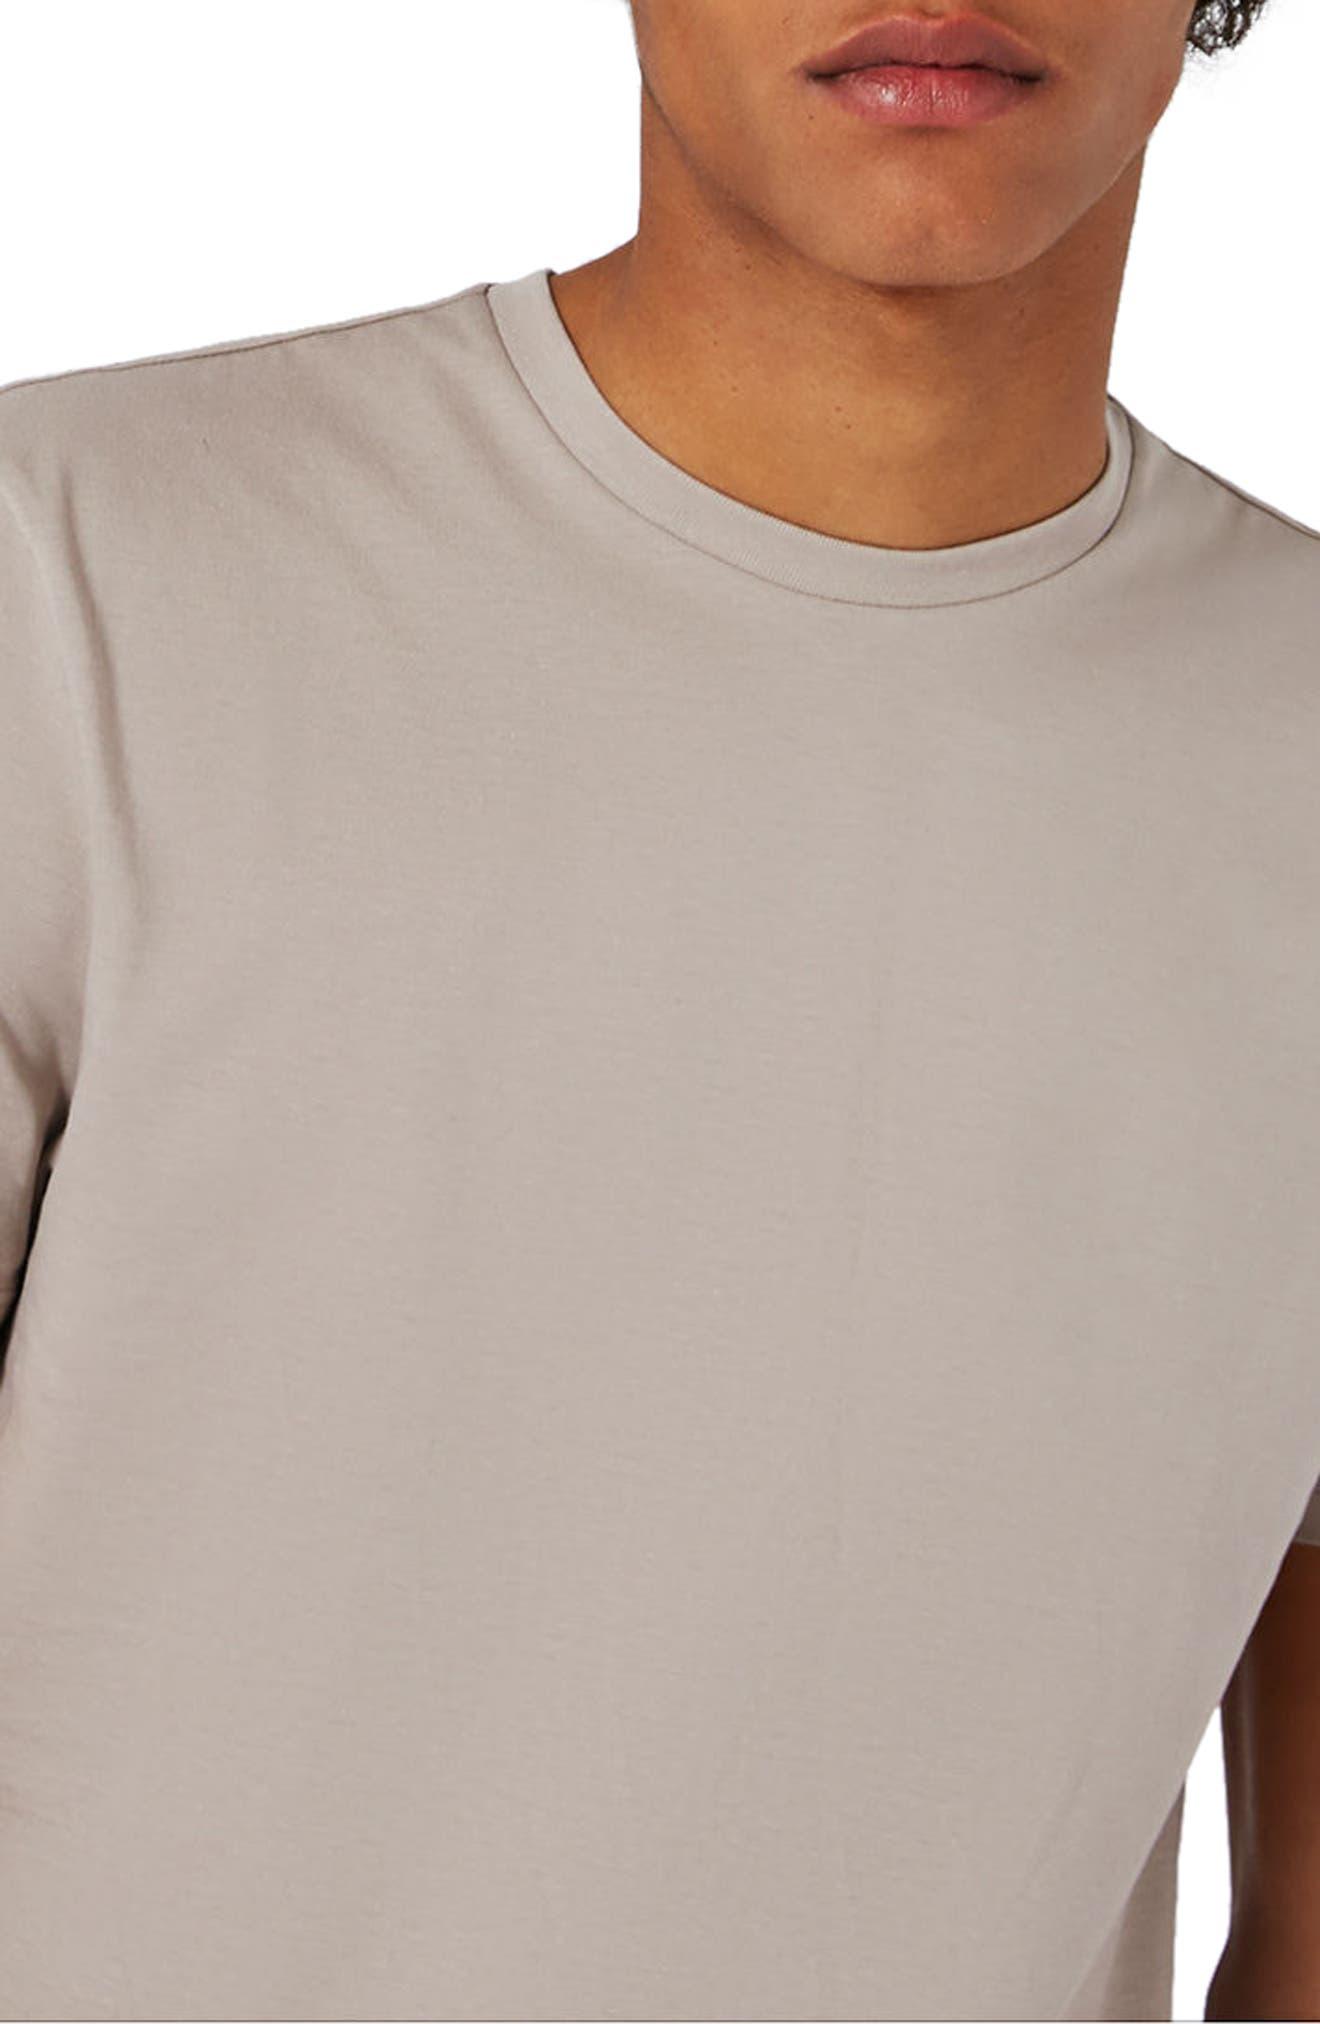 Slim Fit Crewneck T-Shirt,                             Alternate thumbnail 194, color,